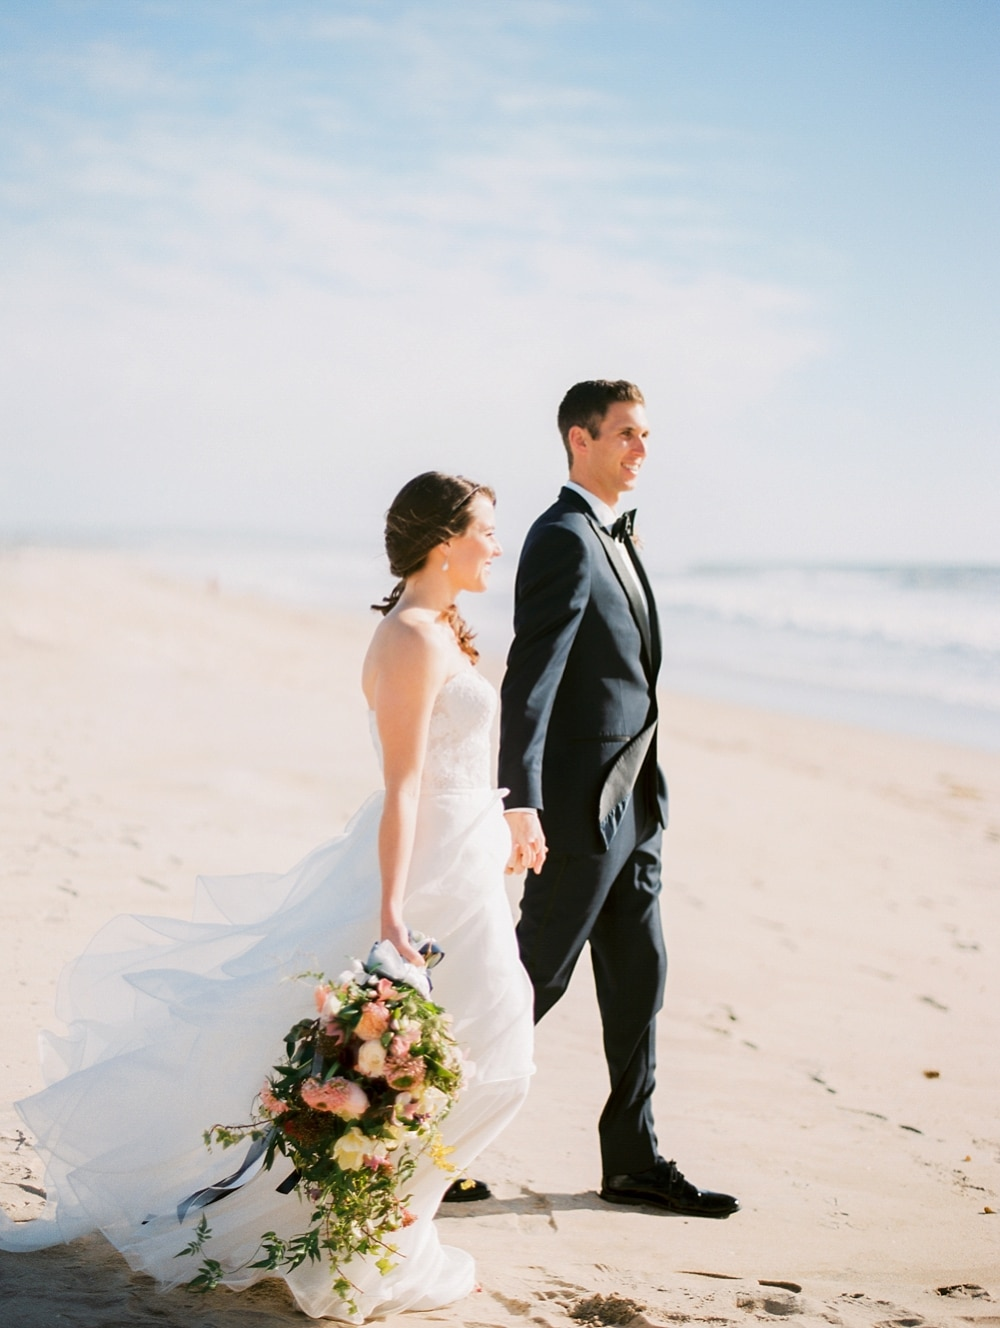 Kristin-La-Voie-Photography-San-Diego-Wedding-Photographer-1